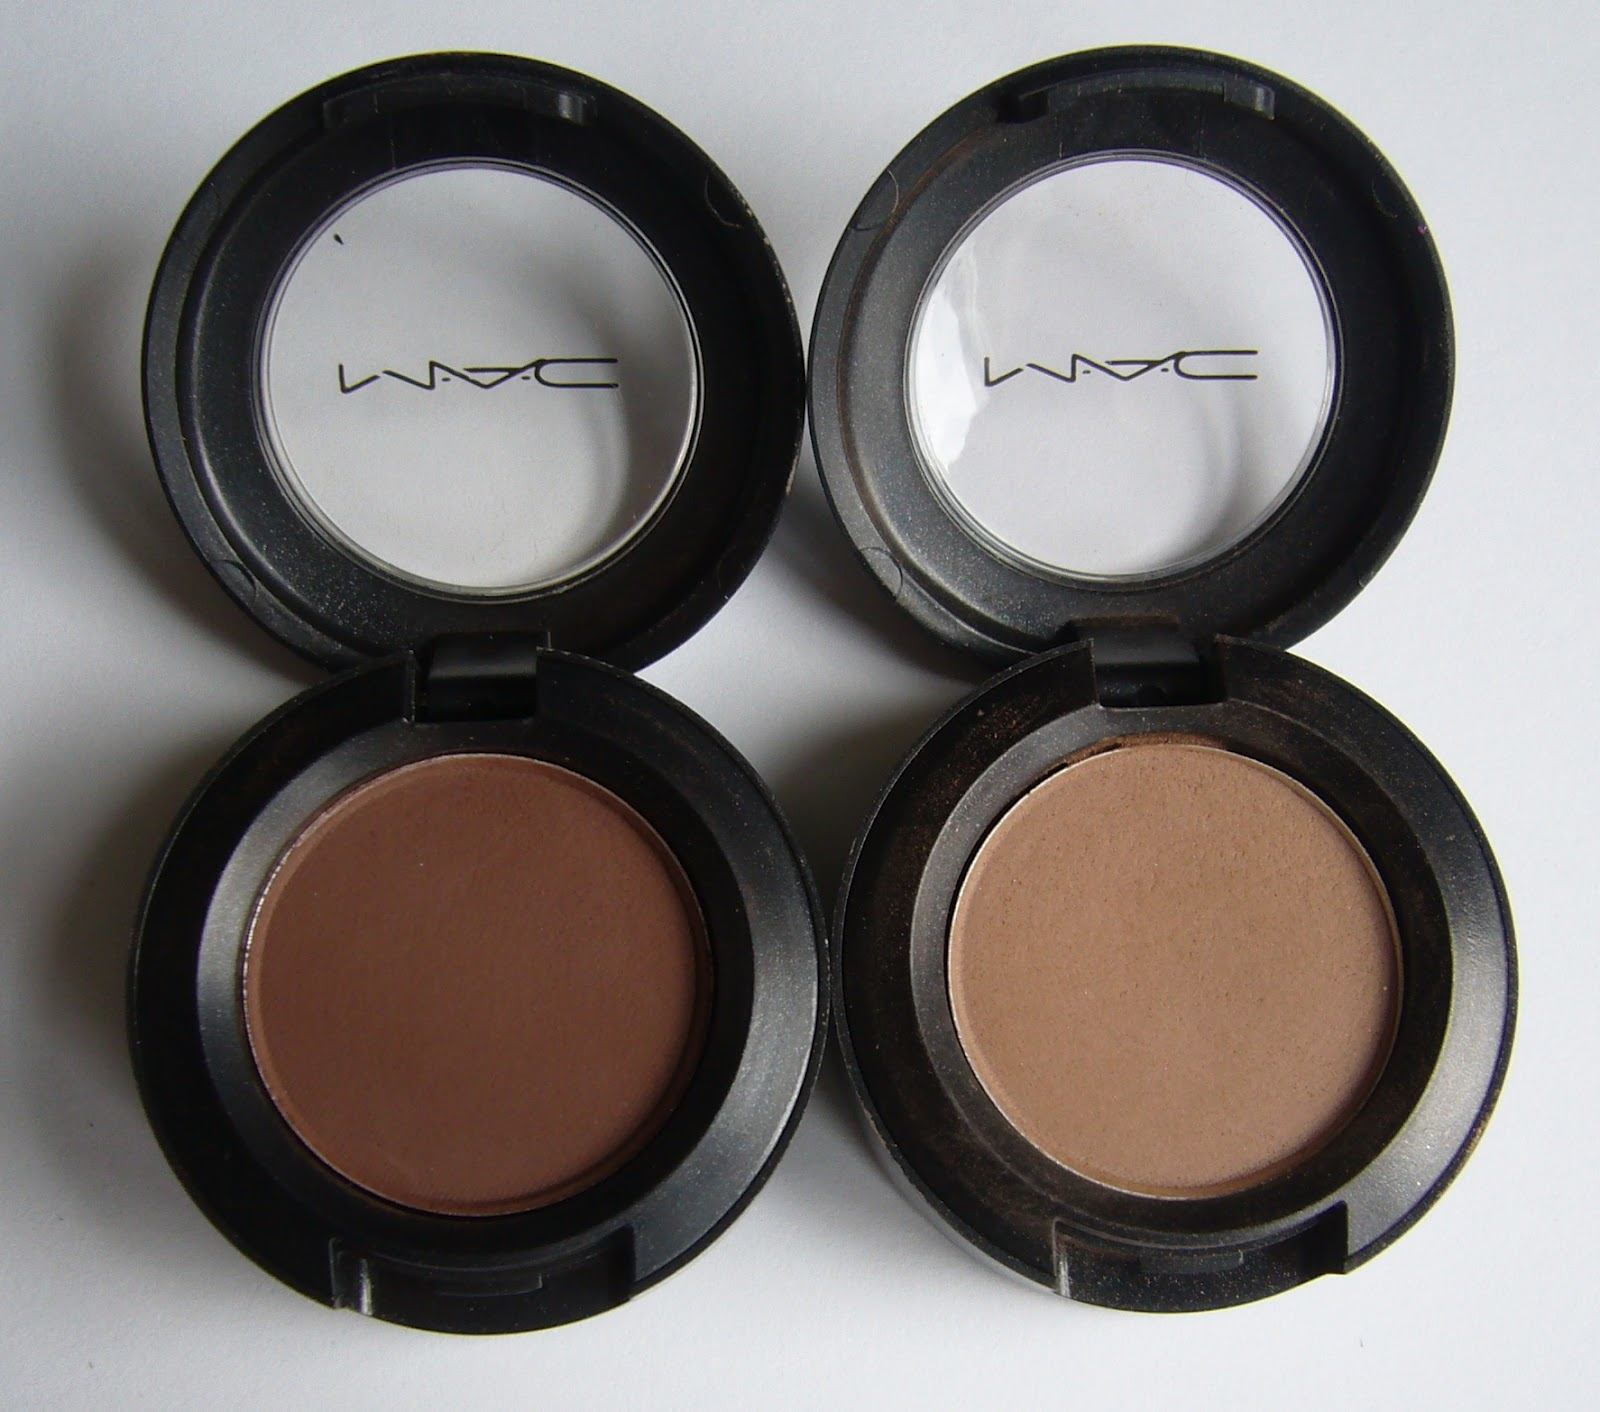 MAC brown matte eyeshadow in Corduroy (left) is my go to